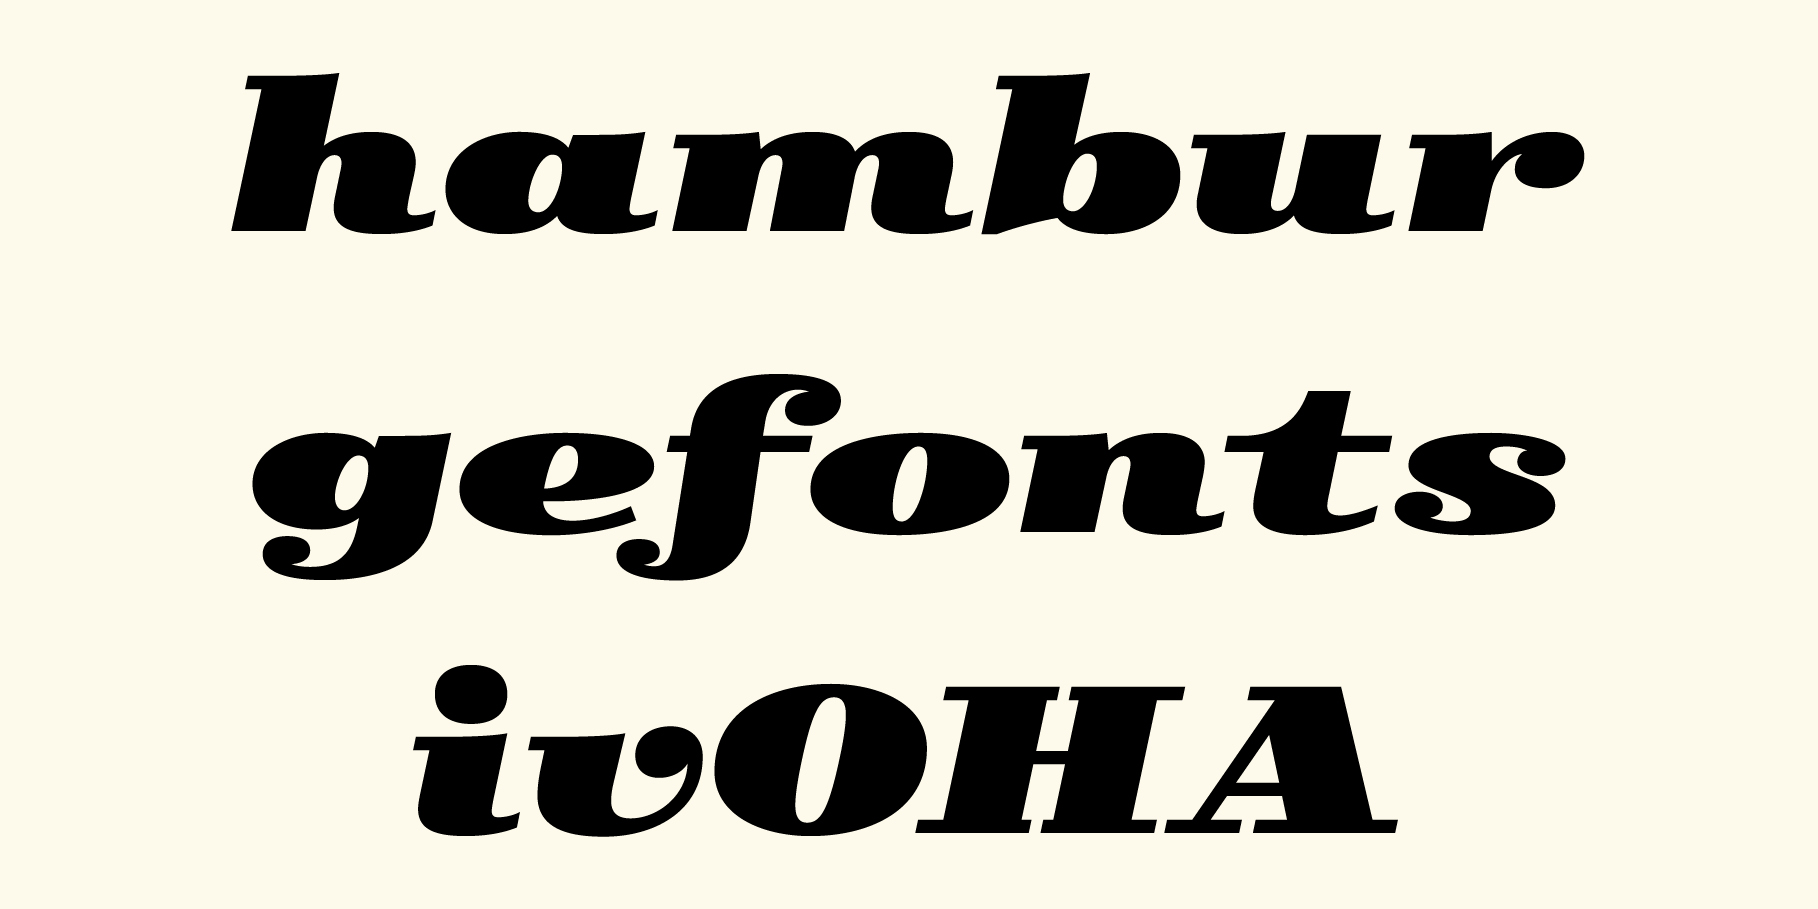 Type-Ø-Tones' typefaces at the Adobe Typekit Marketplace